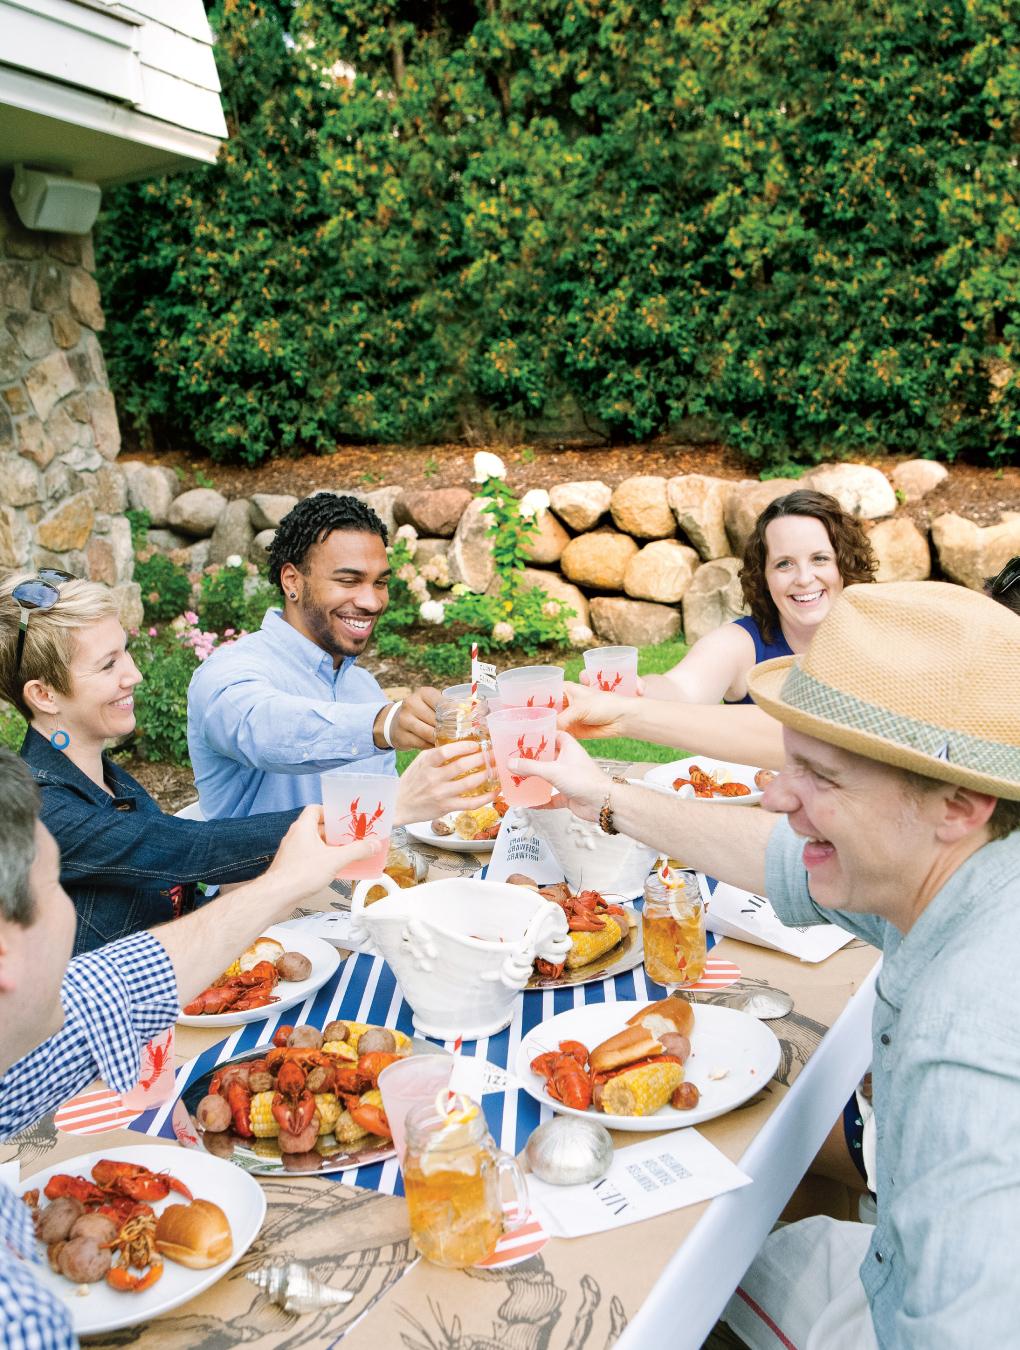 Crawfish-Feast_Outdoor-Summer-Entertaining_Cheers